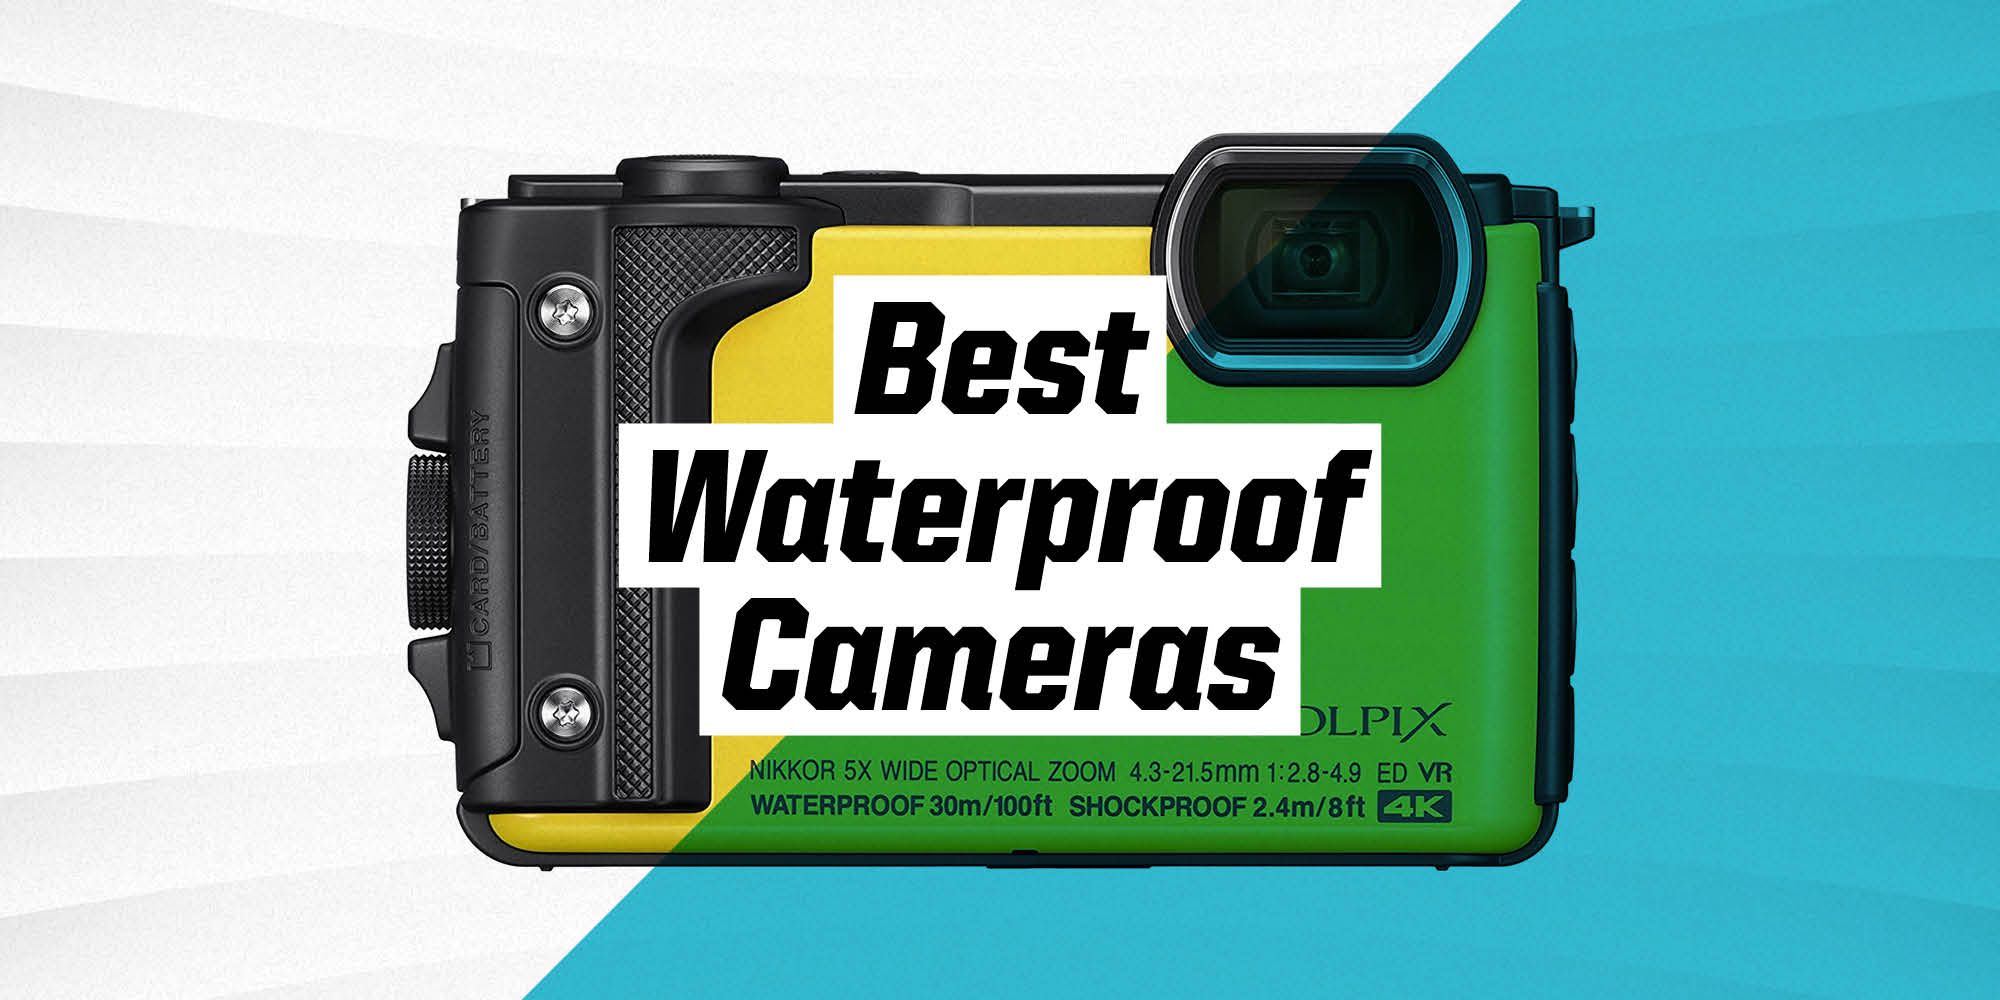 The 7 Best Waterproof Cameras for Taking Underwater Photos